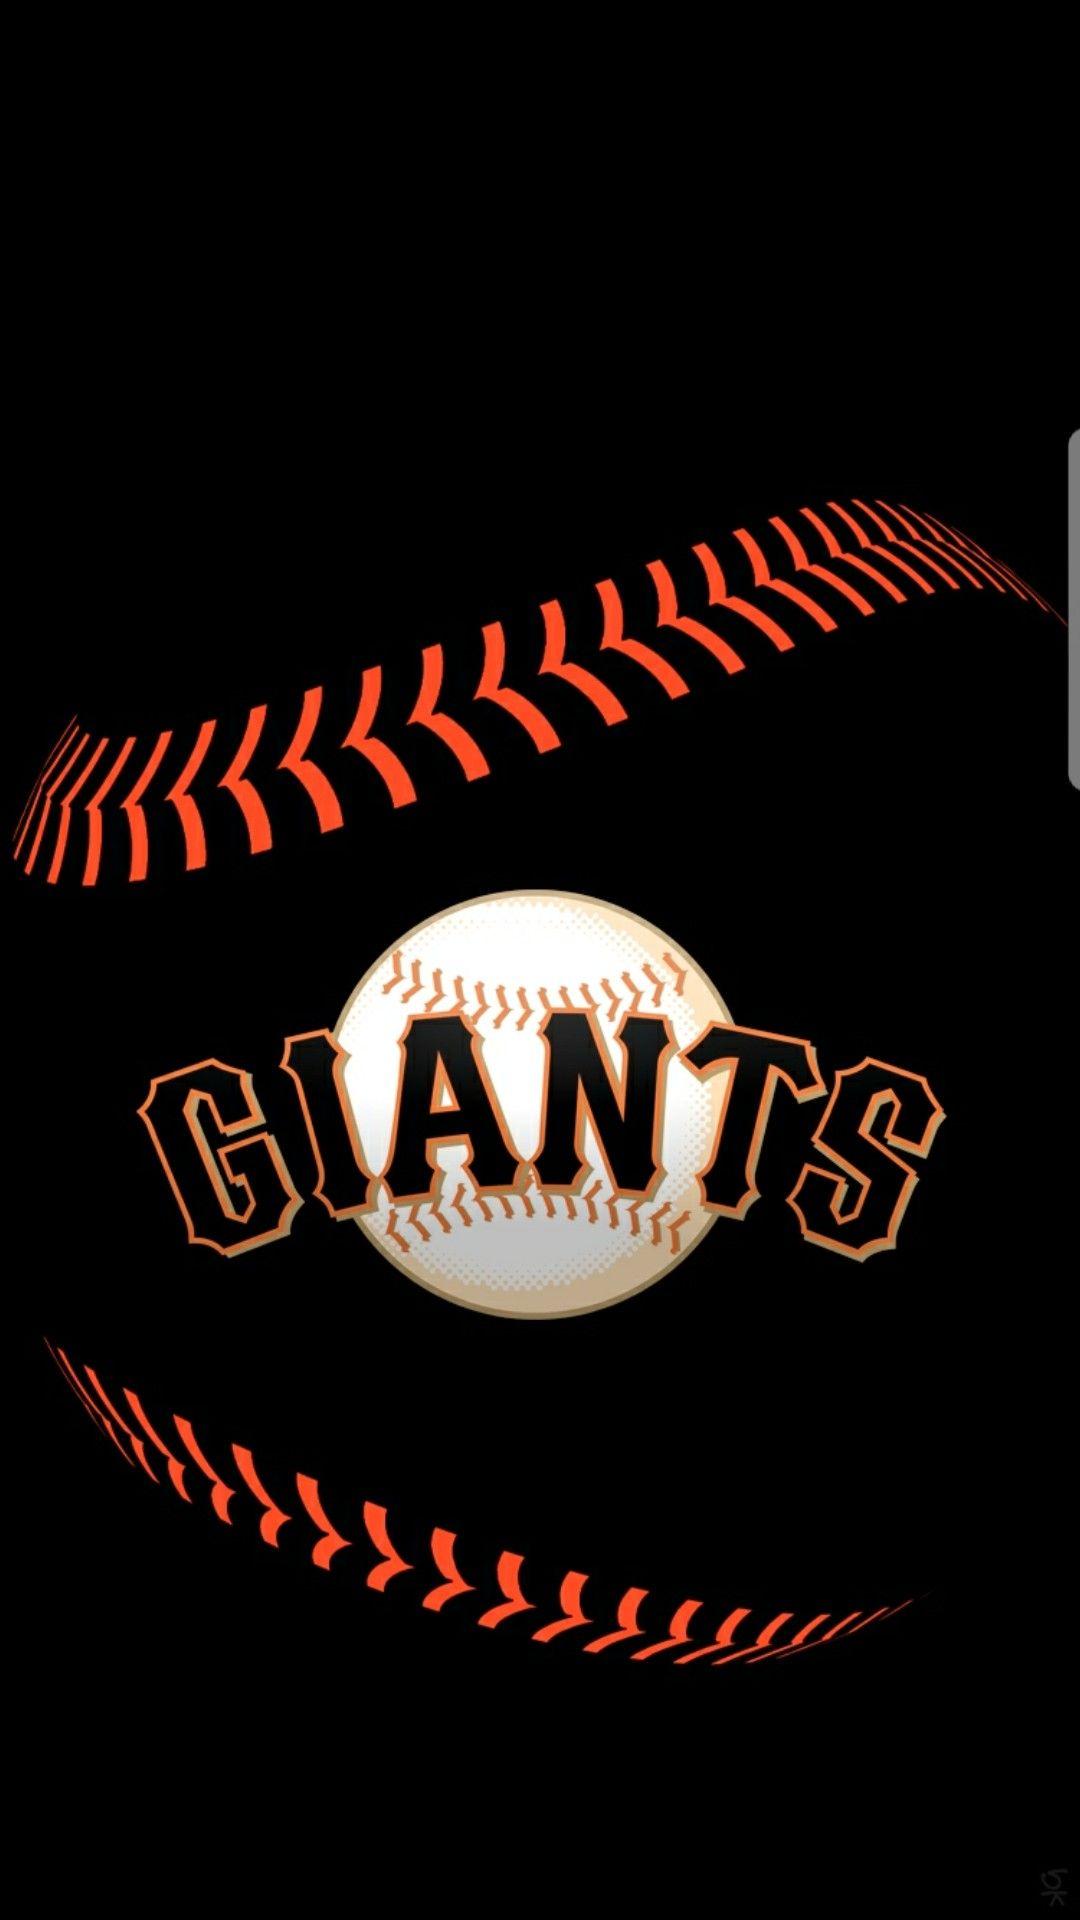 Love This Wallpaper Wearegiants Sf Giants Baseball Sf Giants